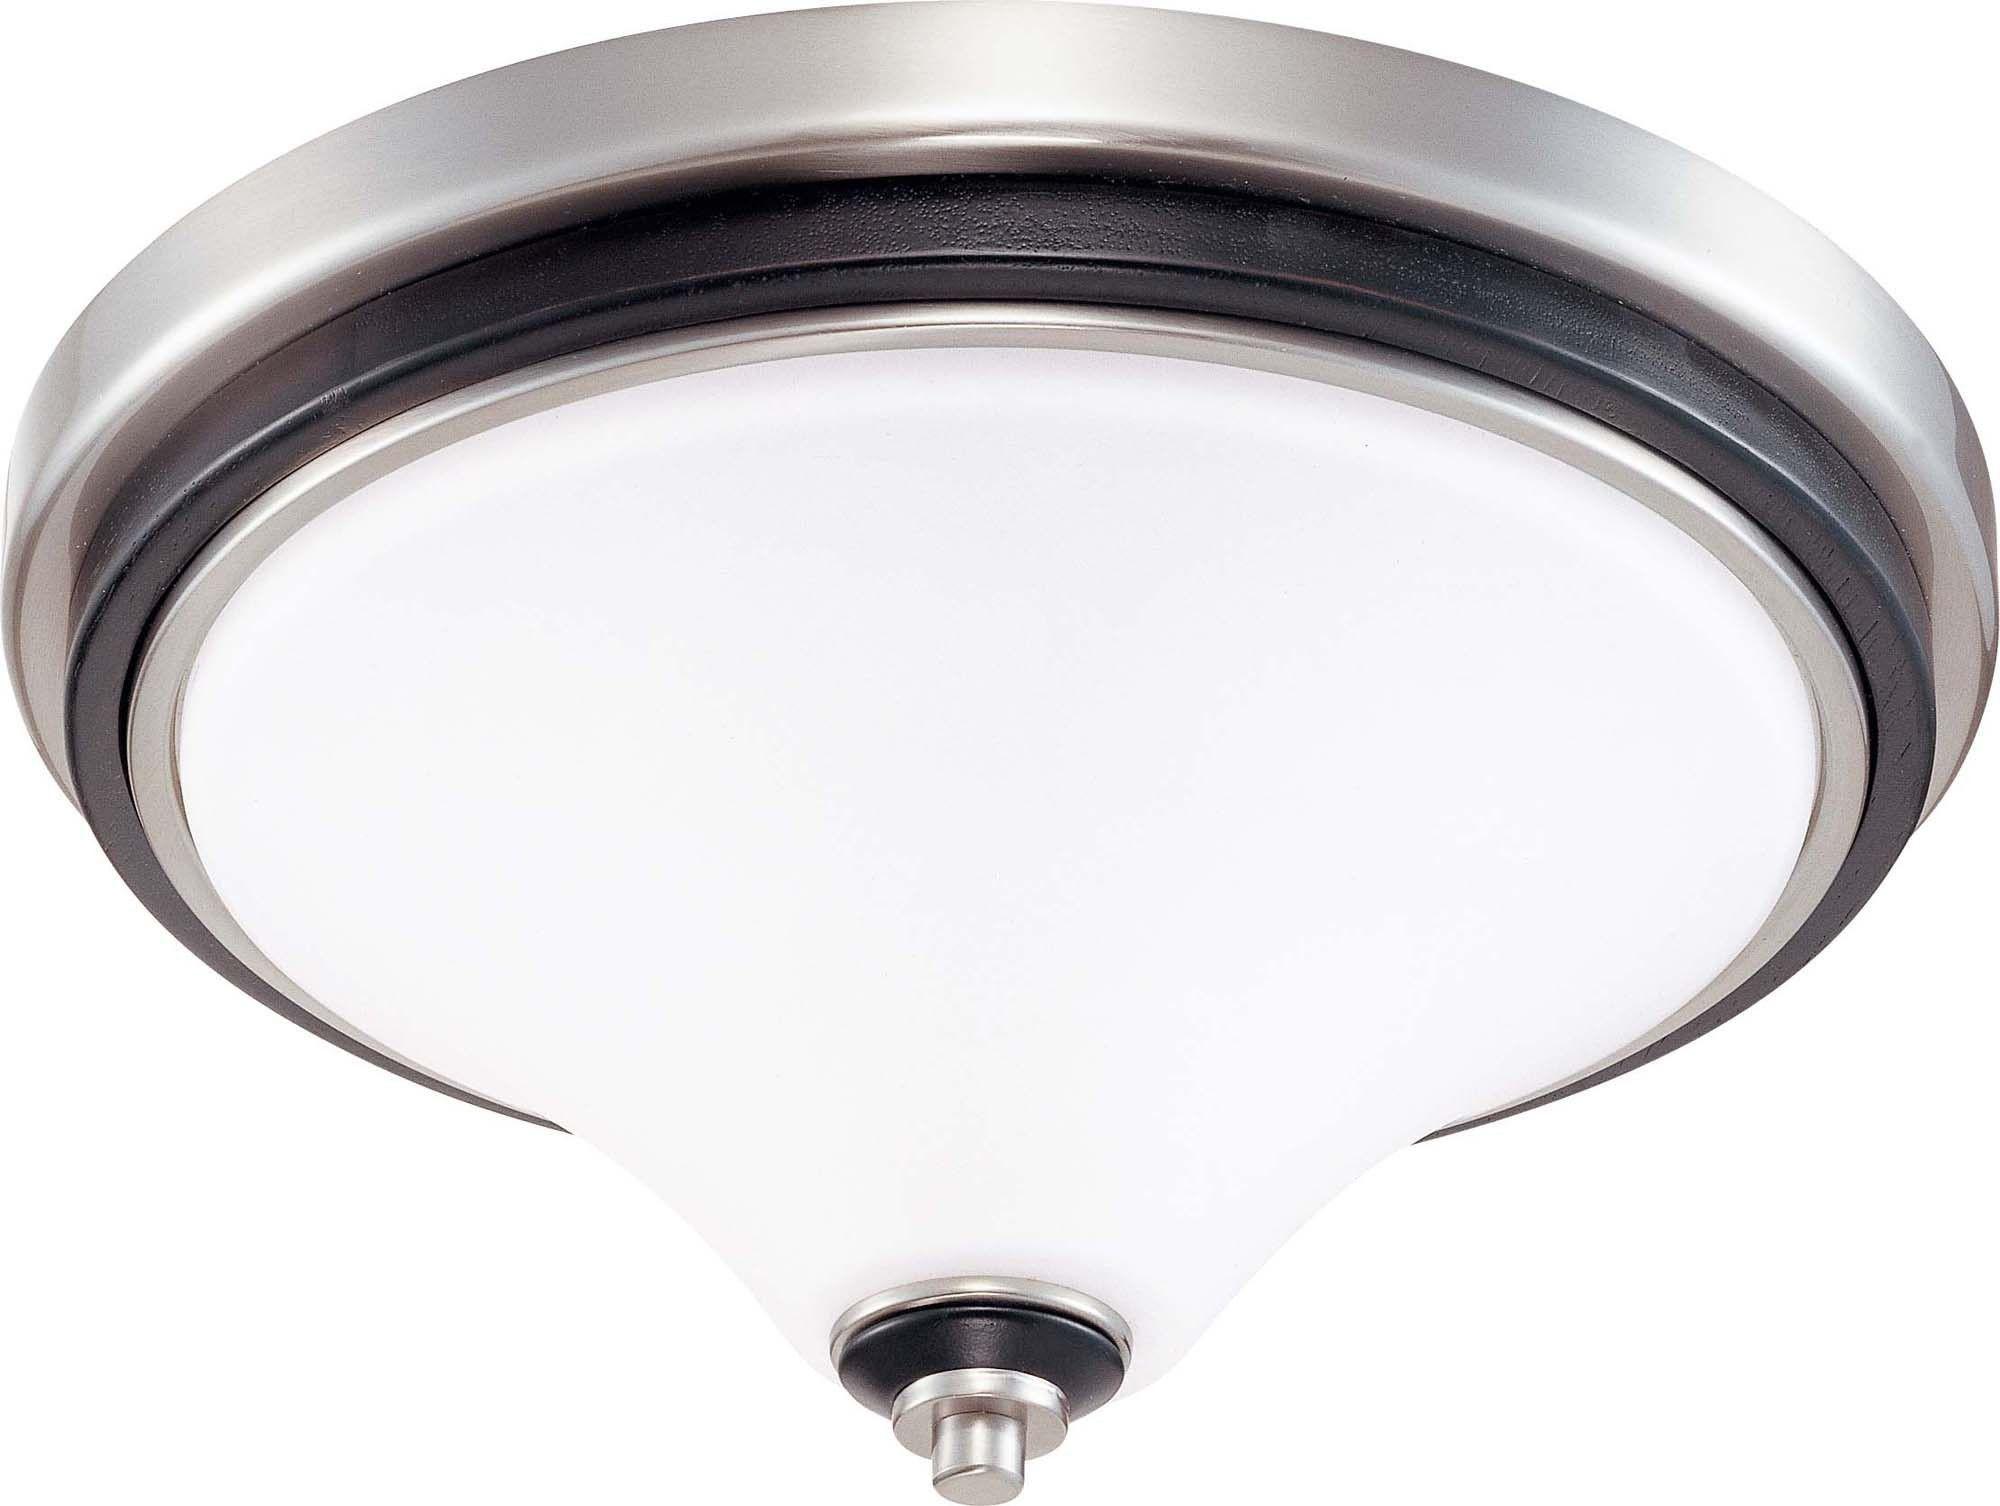 Nuvo Keen - 2 Light 13 inch Flush Dome w/ Satin White Glass